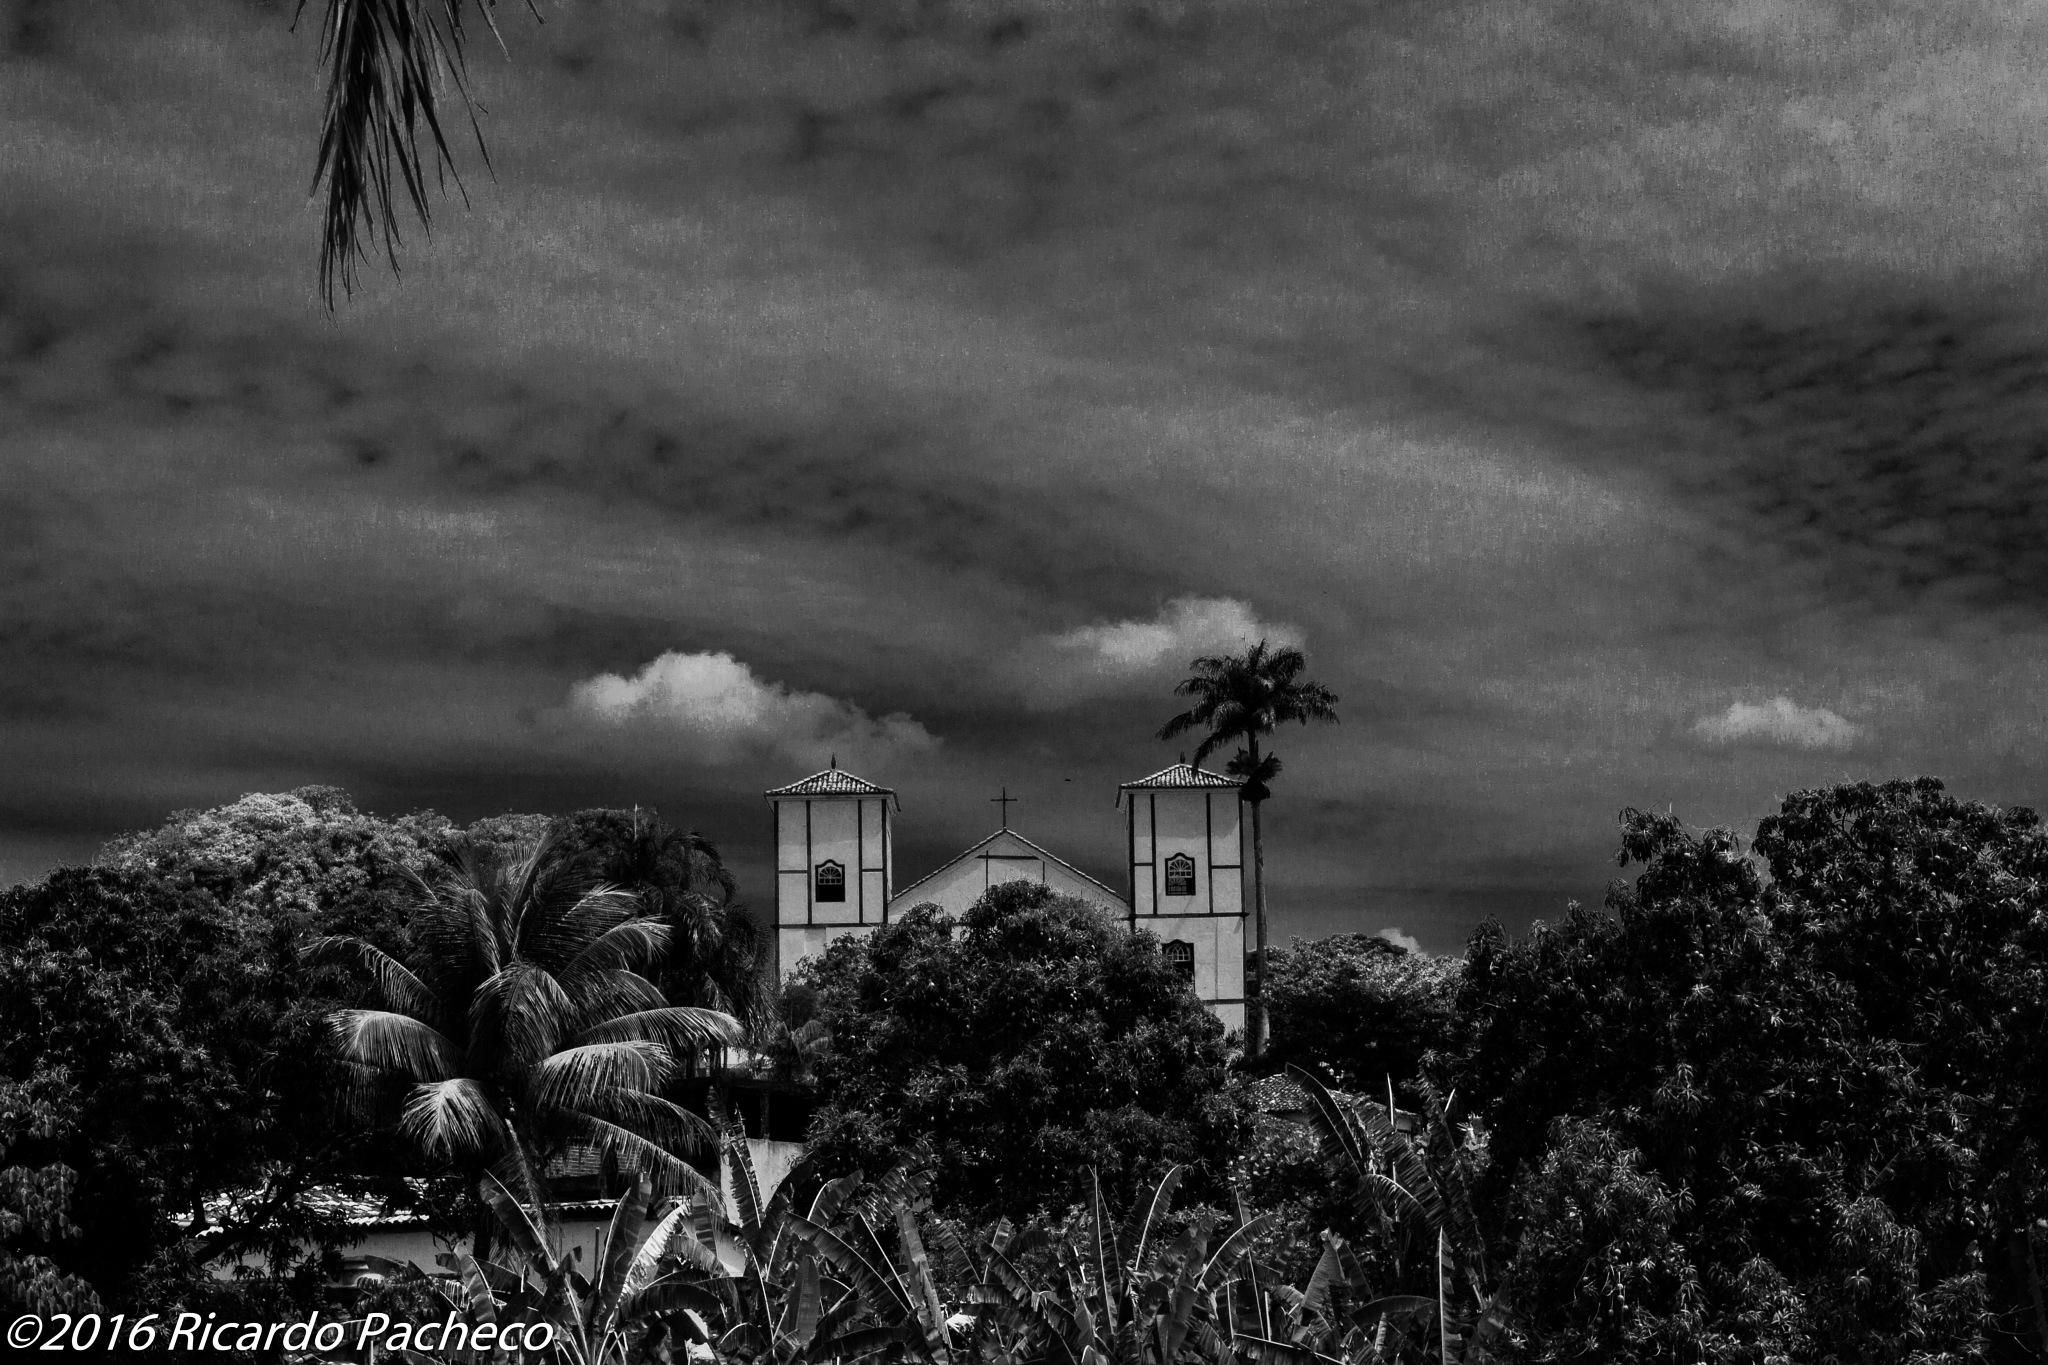 Untitled by Ricardo Pacheco